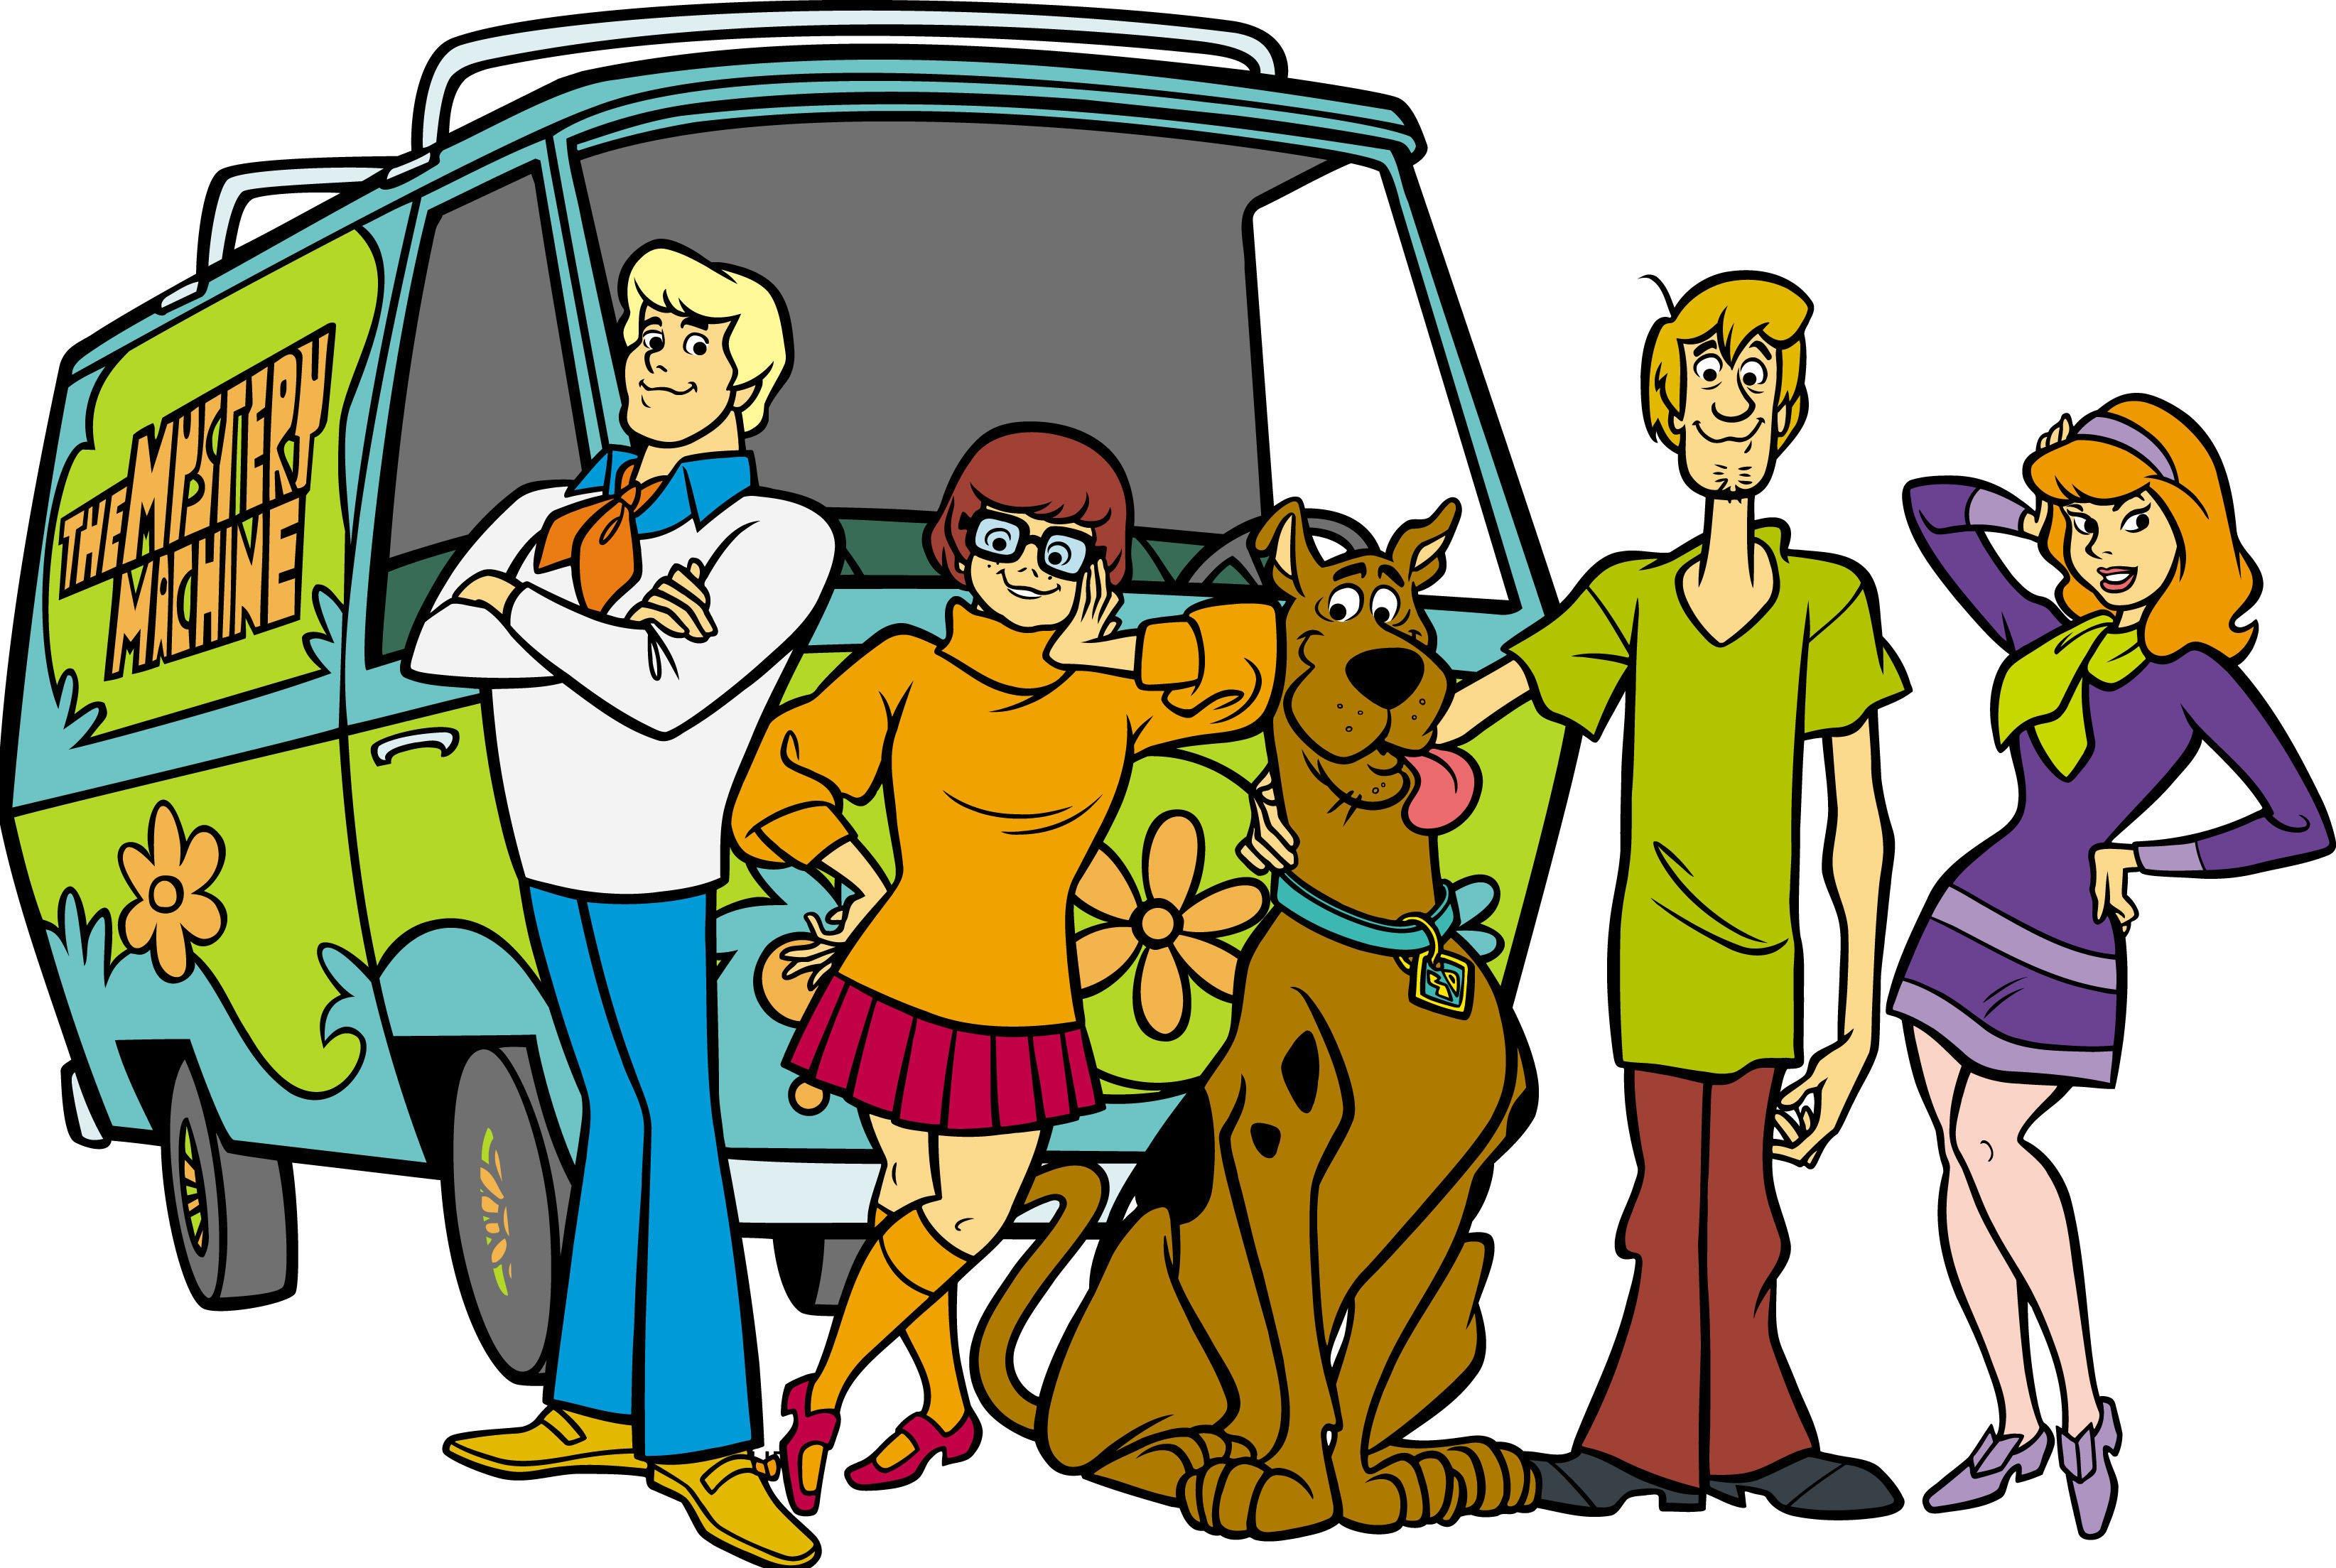 Scooby Doo HD Wallpaper 3288x2207